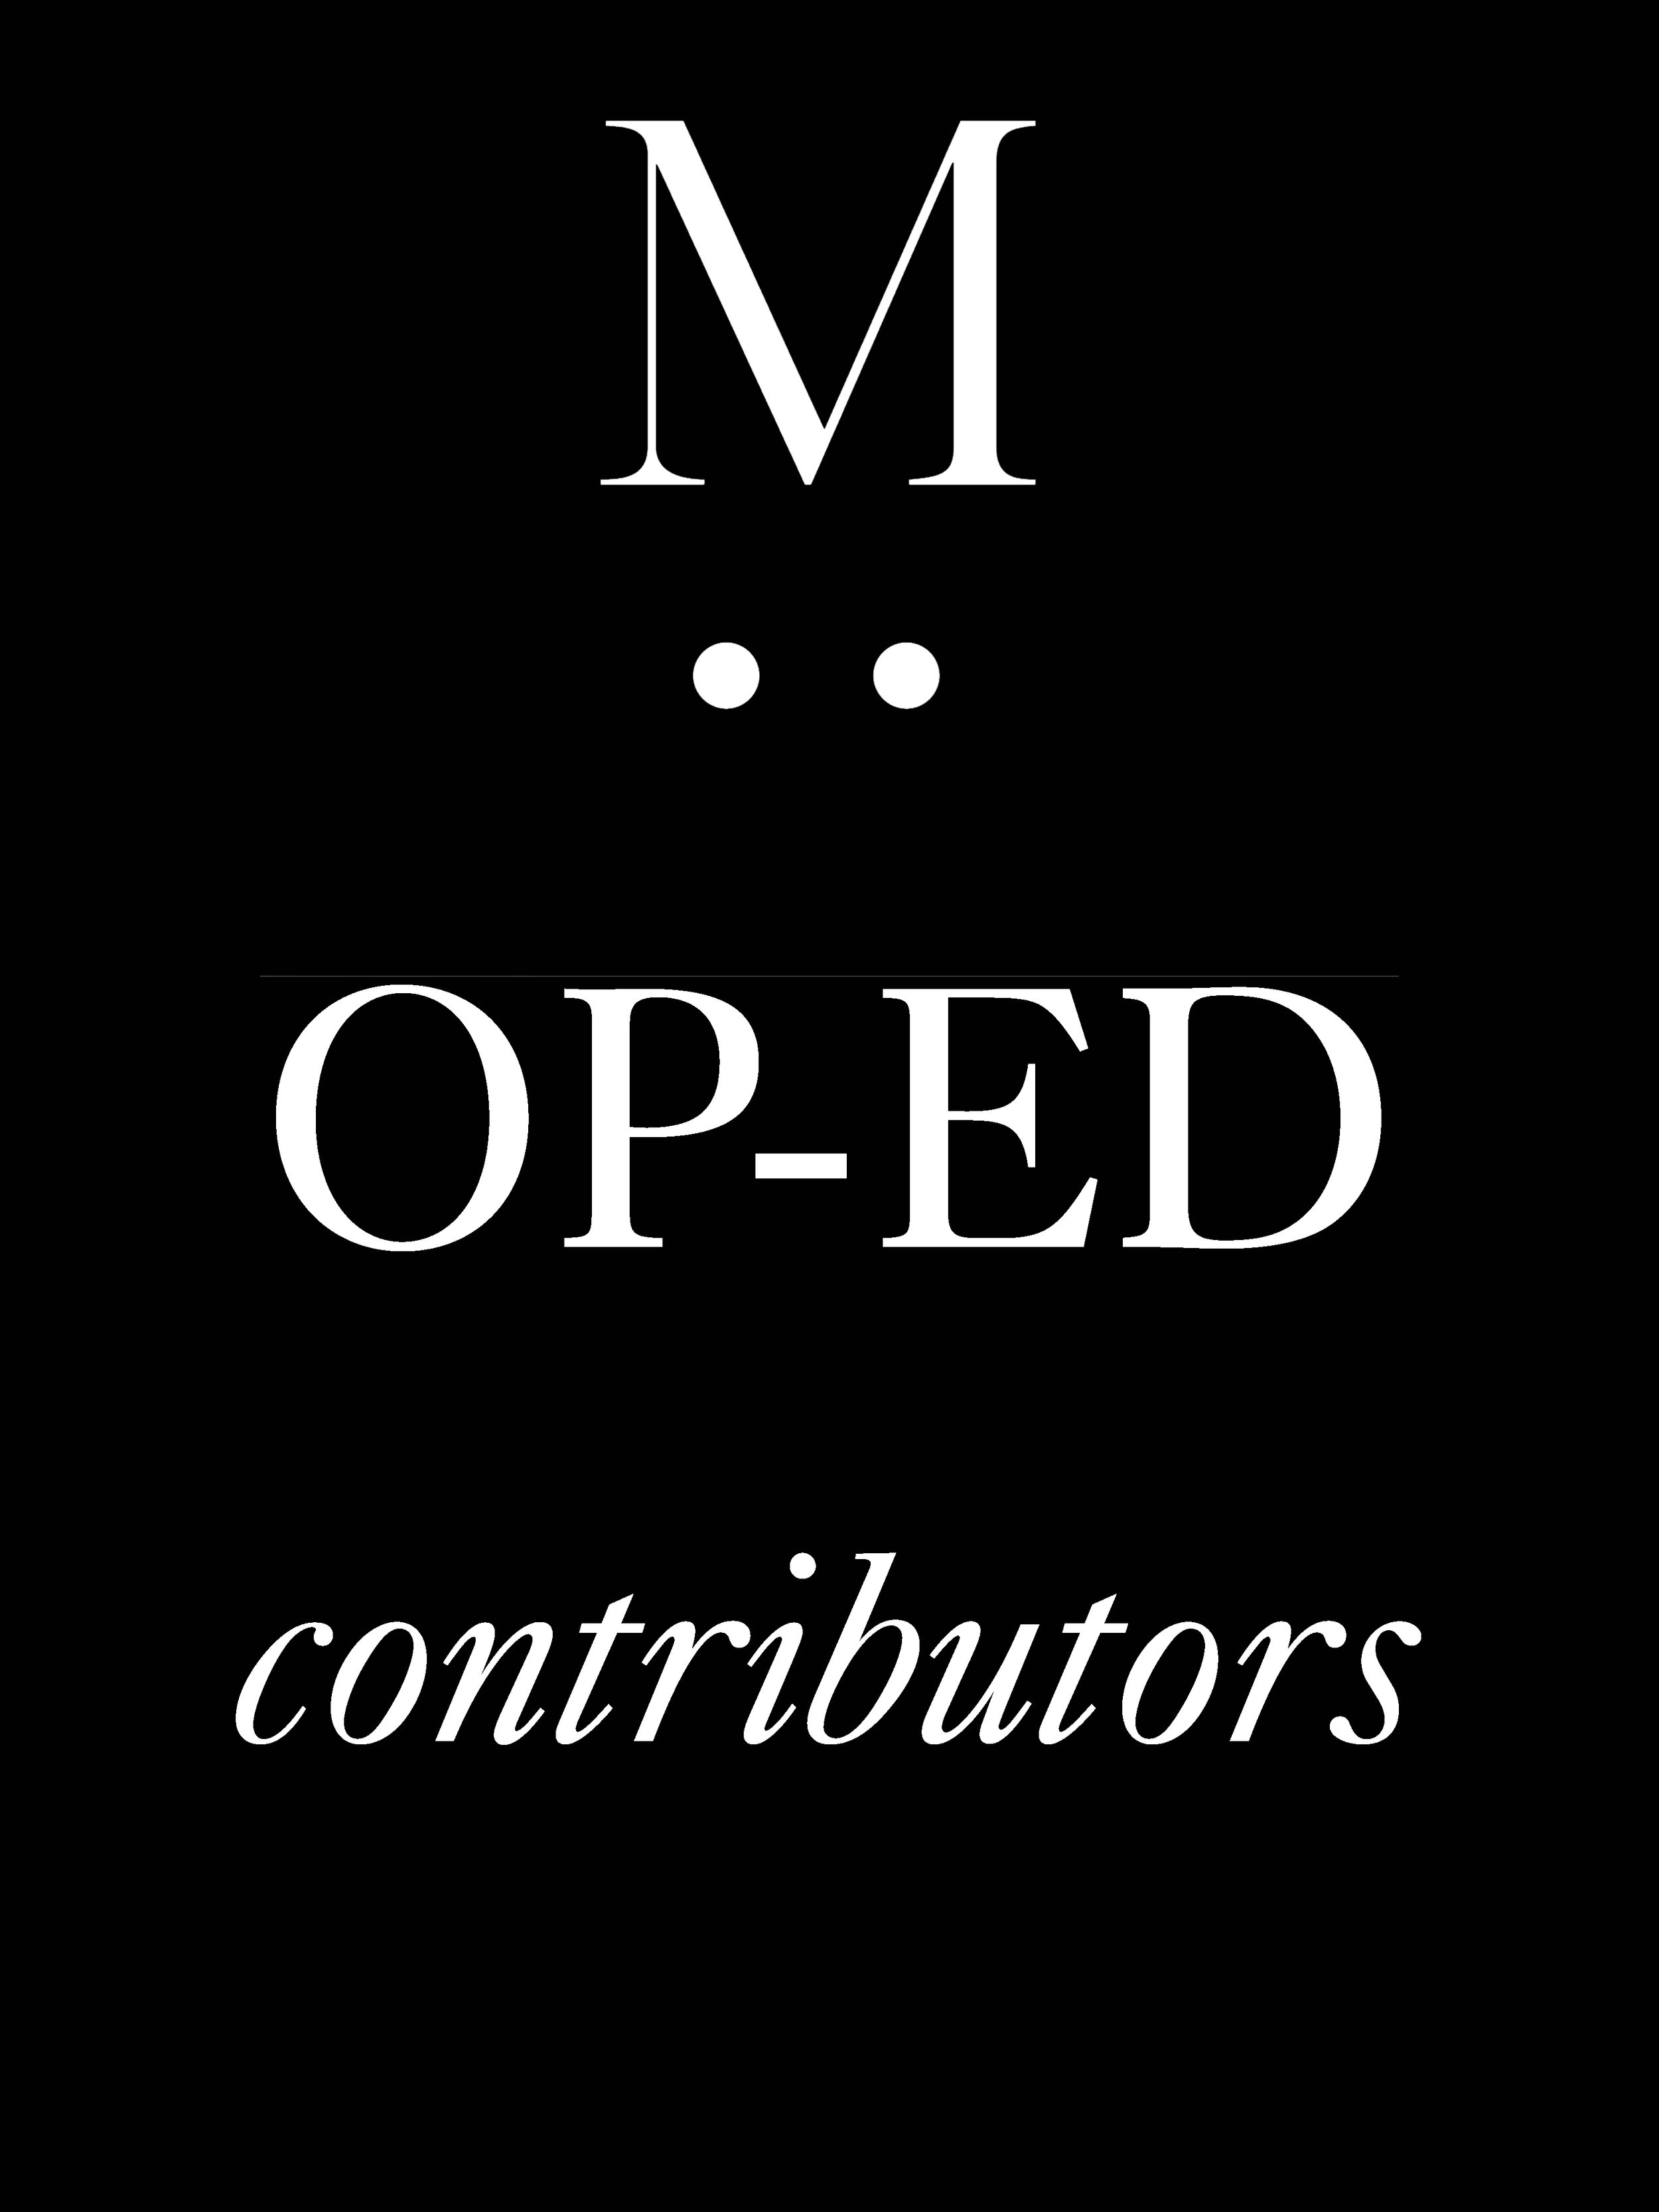 OP-ED_more contributors_larger .jpg